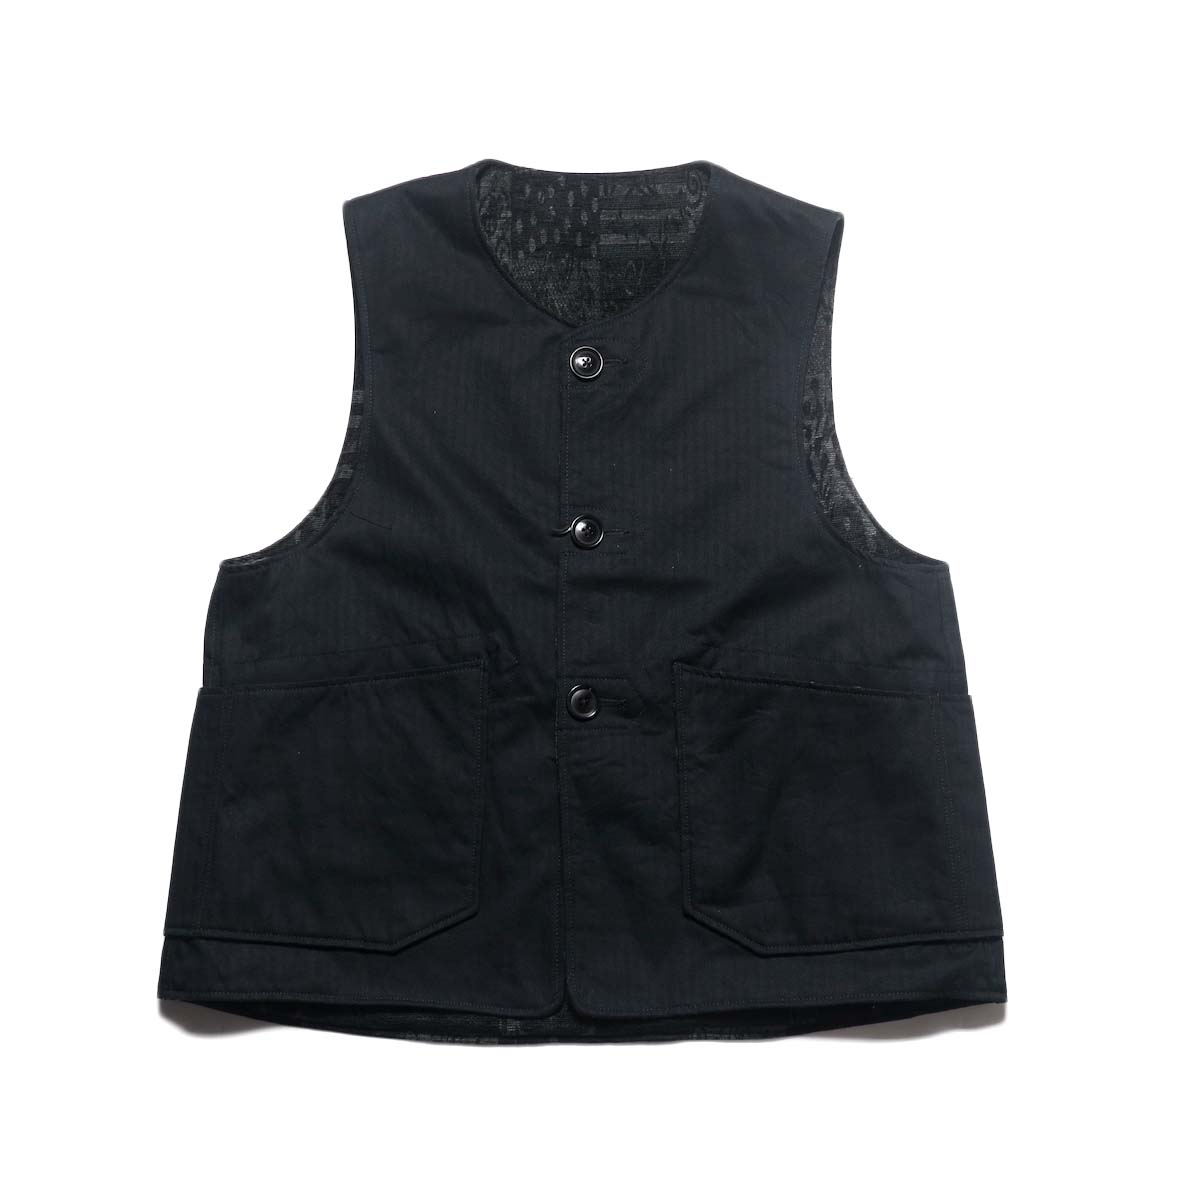 Engineered Garments / Over Vest -HB Twill (Black)